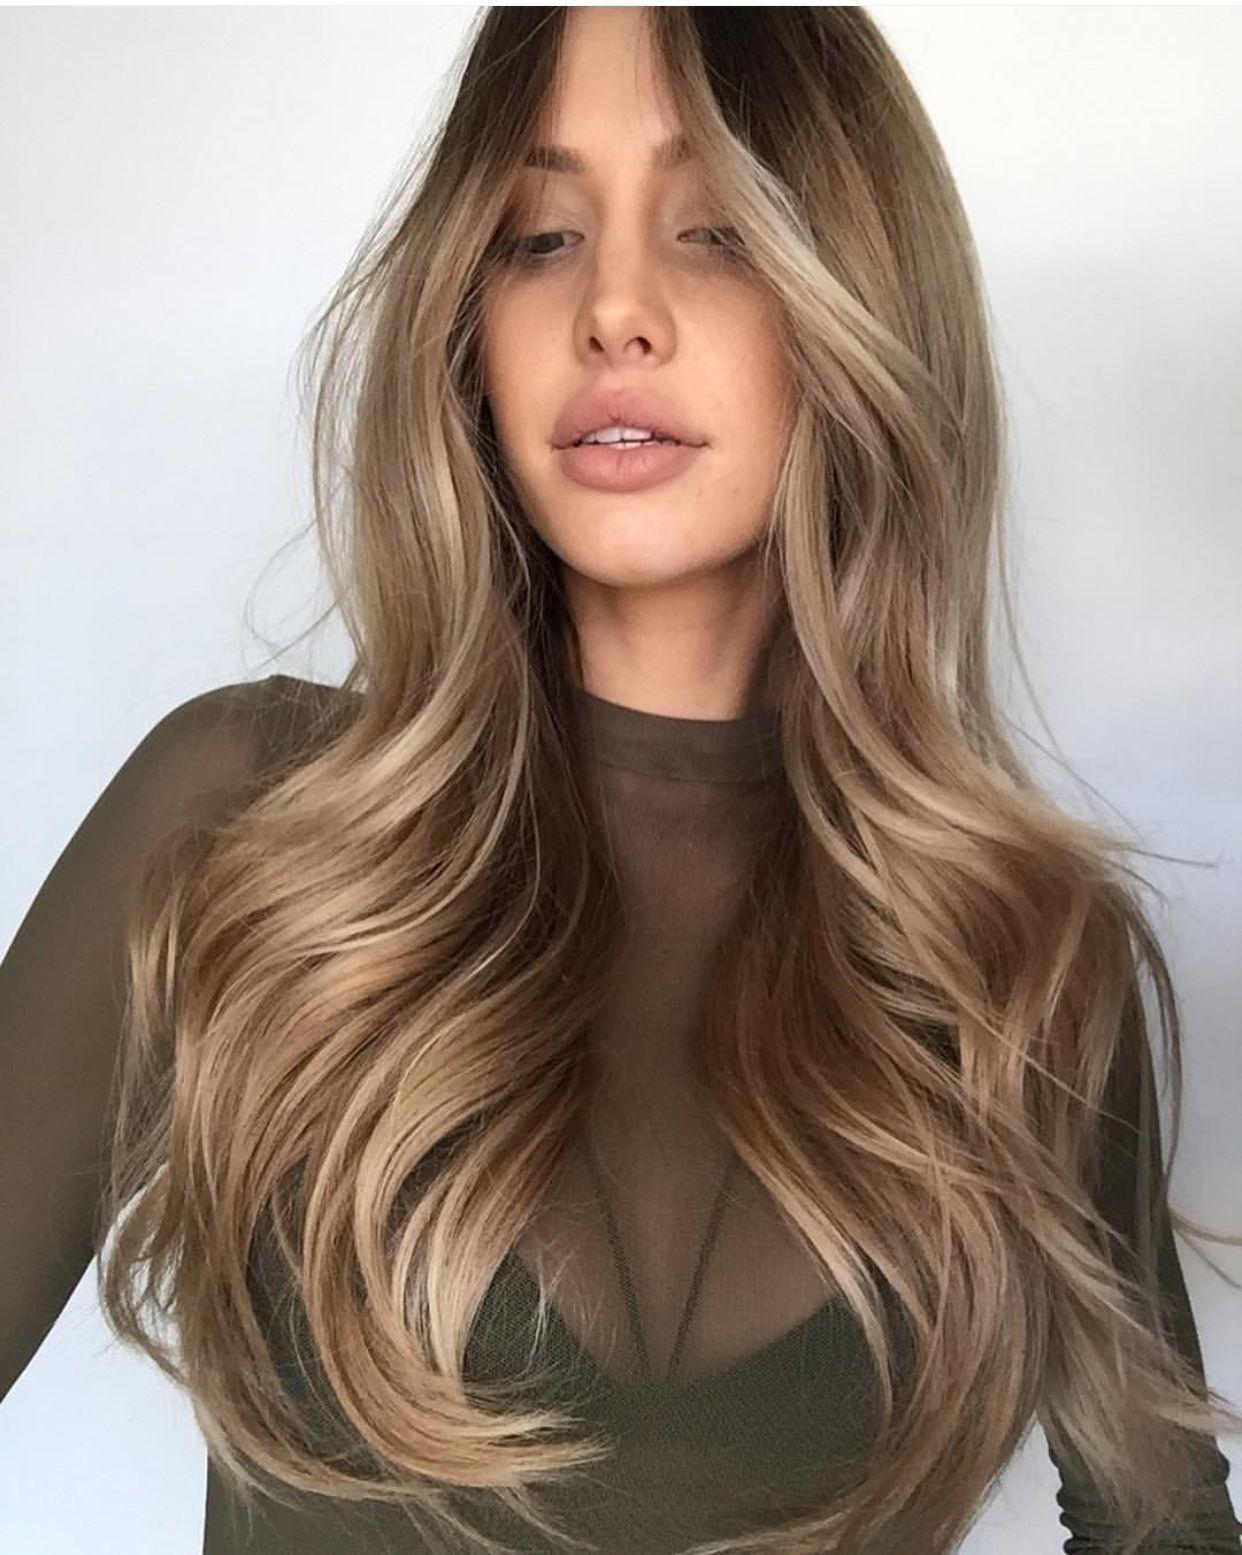 Caramelo Pelo Dark Blonde Hair Color Long Hair Color Hair Styles